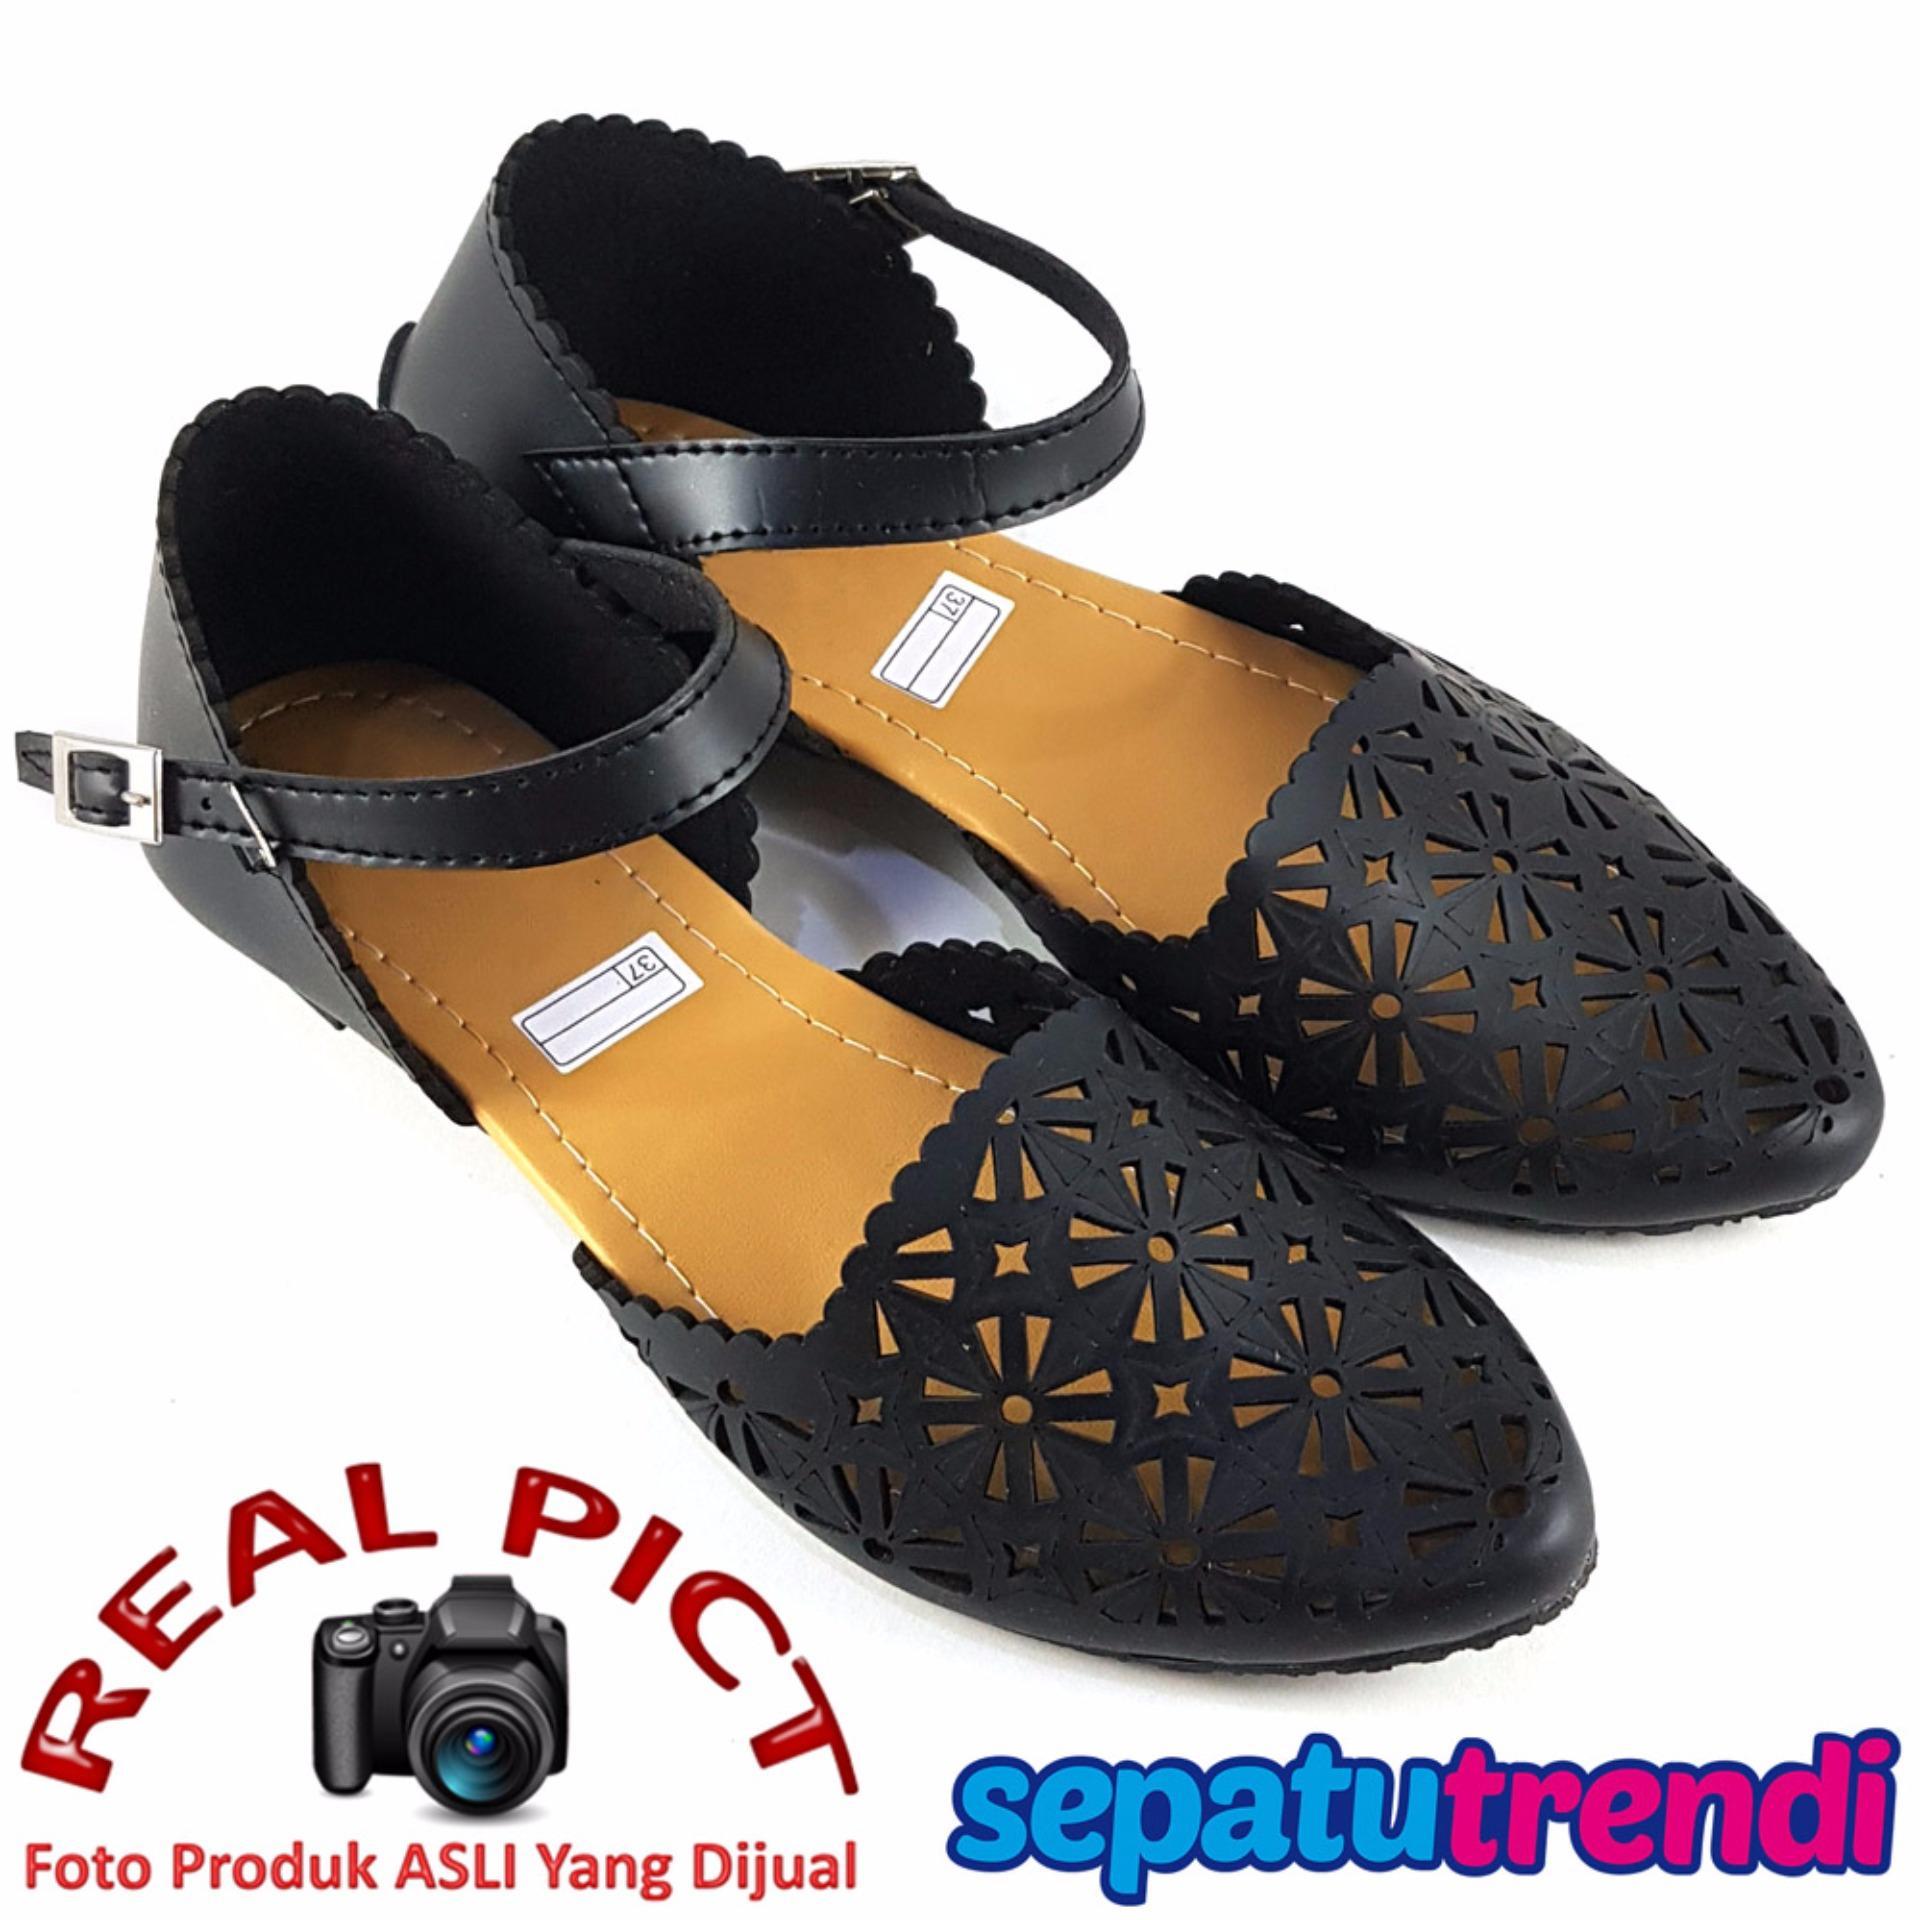 TrendiShoes Sepatu Wanita Flat Shoes d'Orsay Laser Cut DT24 - Hitam